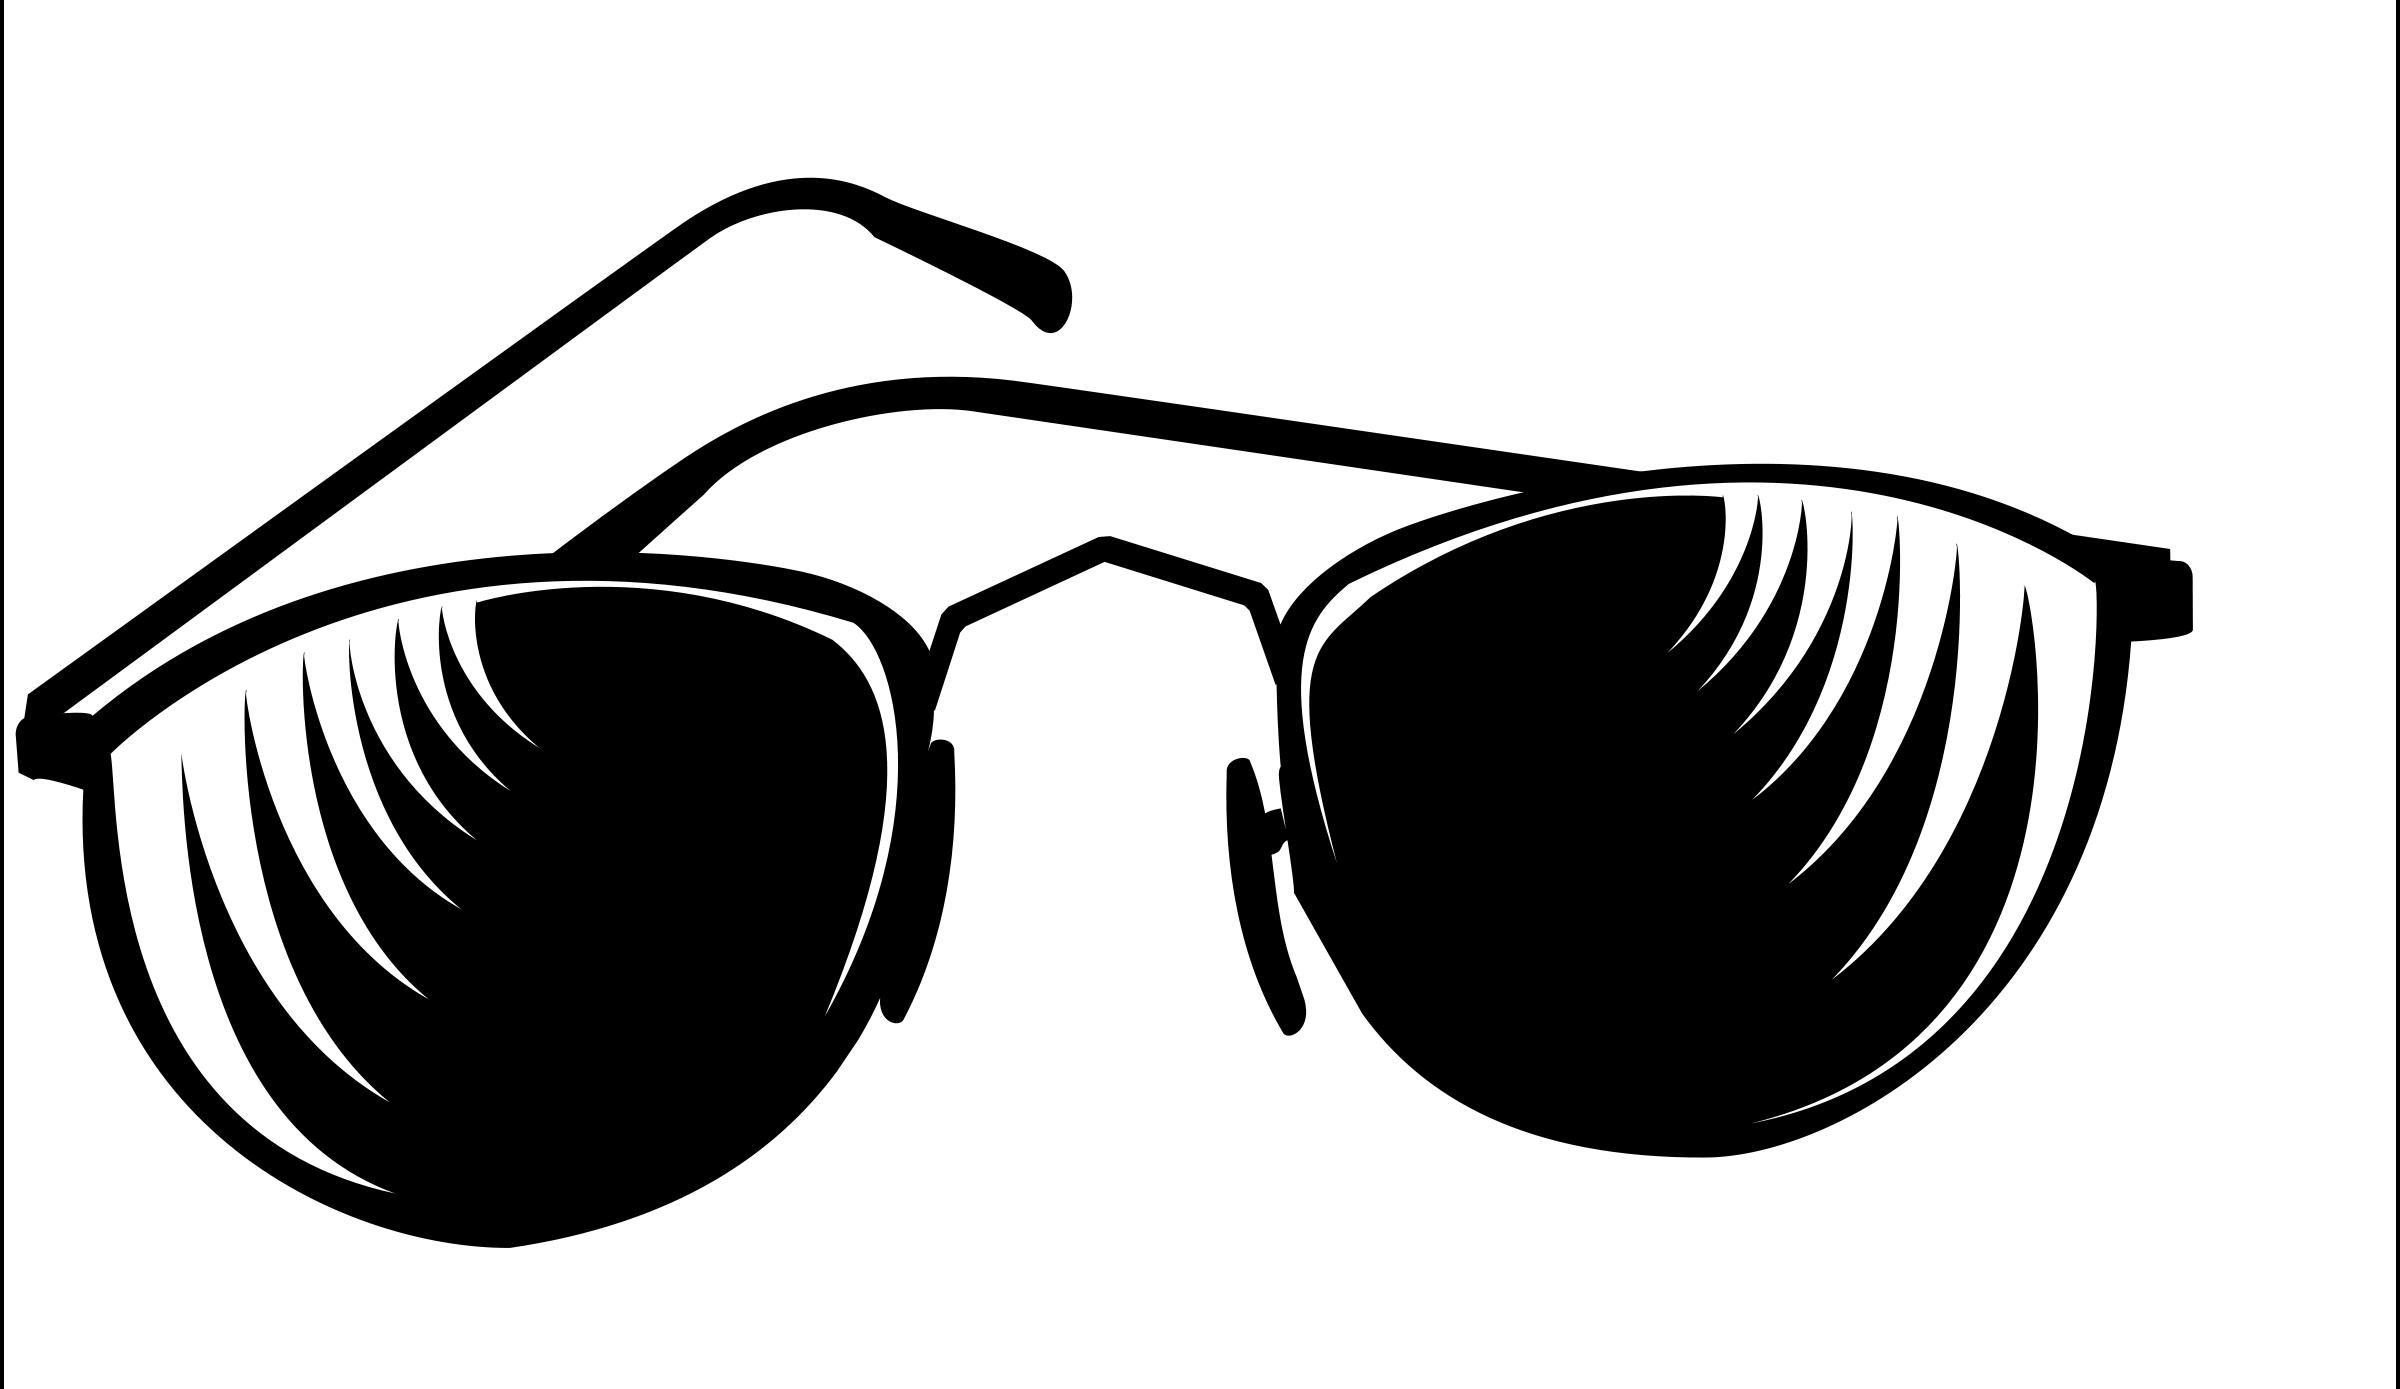 Sunglasses glasses clip art 2